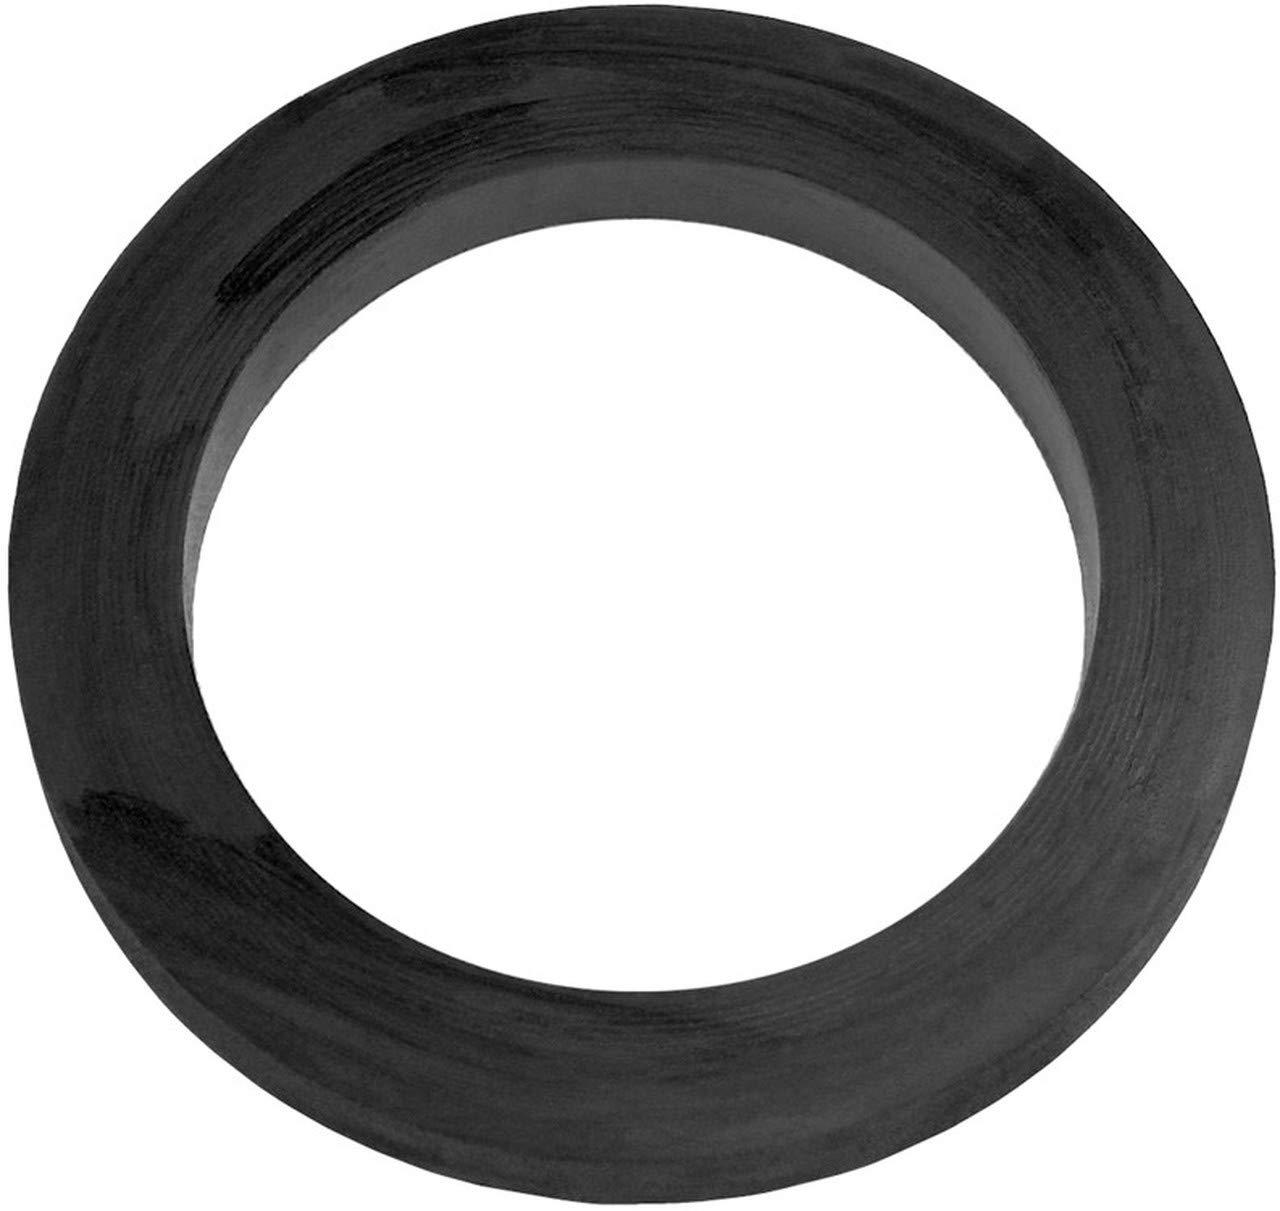 4 CAMLOCK Gasket 5 gaskets Black Buna//NBR, CAM and Groove